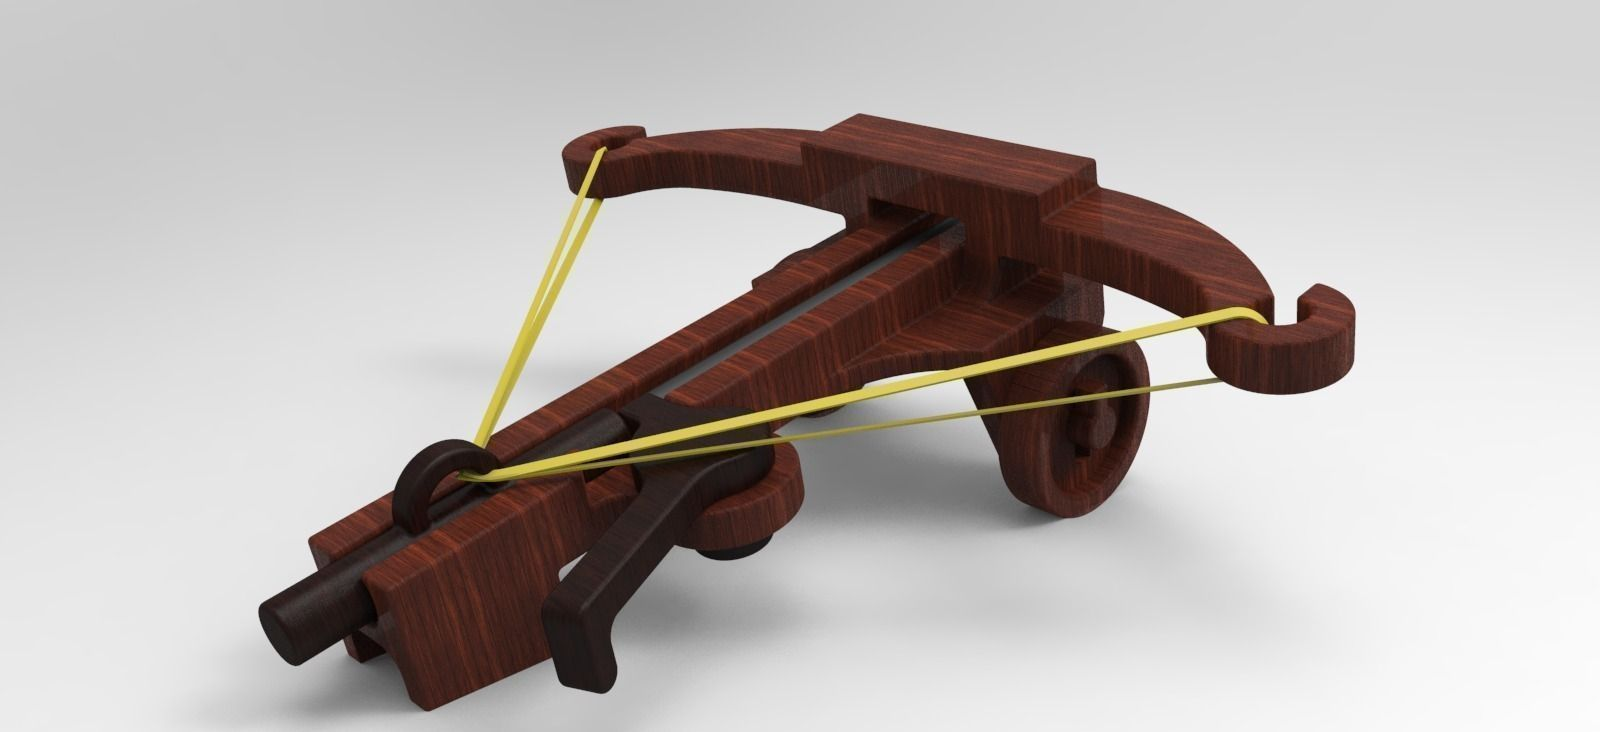 Desktop Balista 3D Model .stl - CGTrader.com